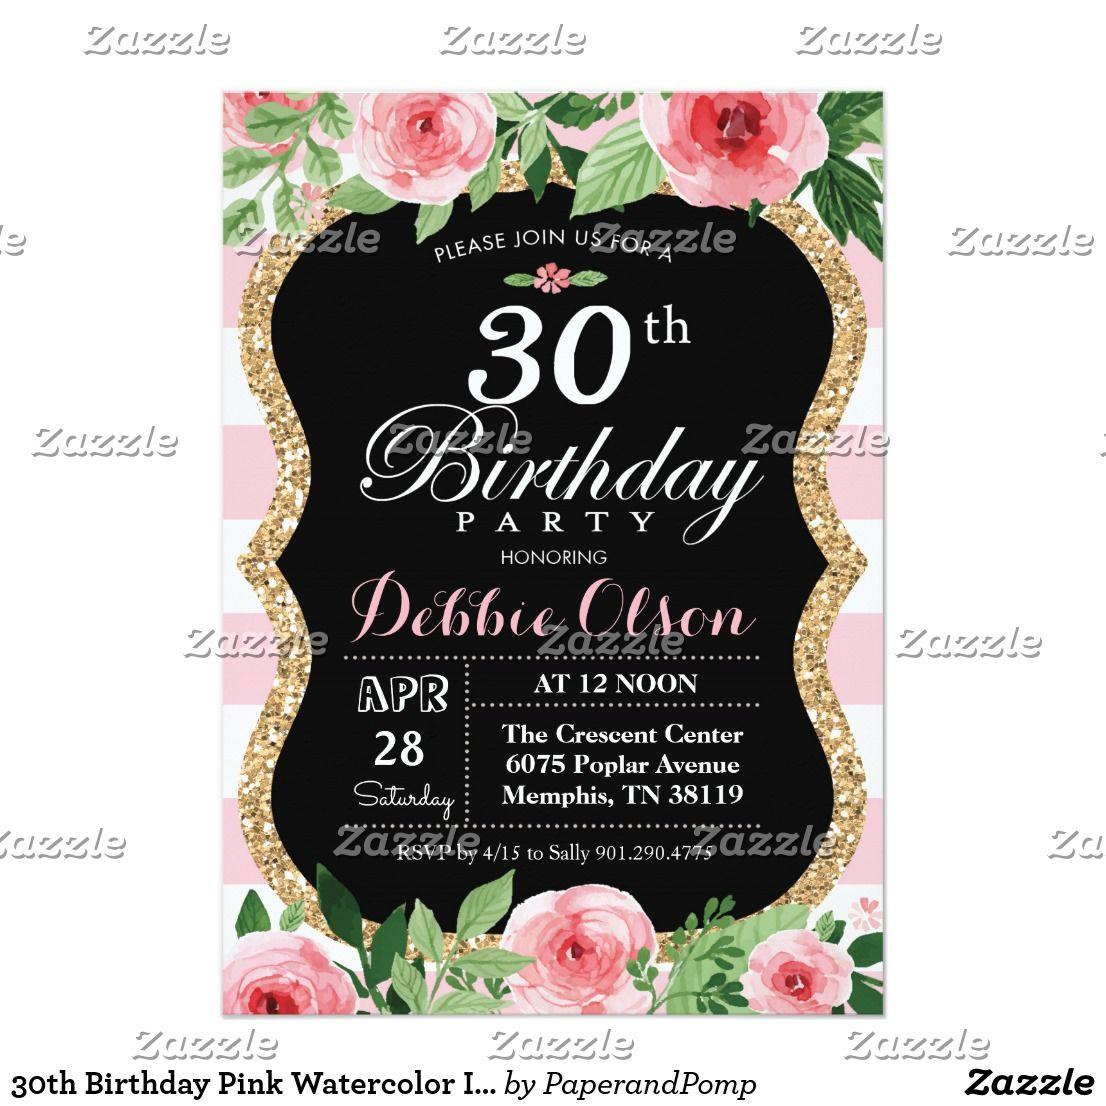 30th Birthday Pink Watercolor Invitation Fun Party Invites